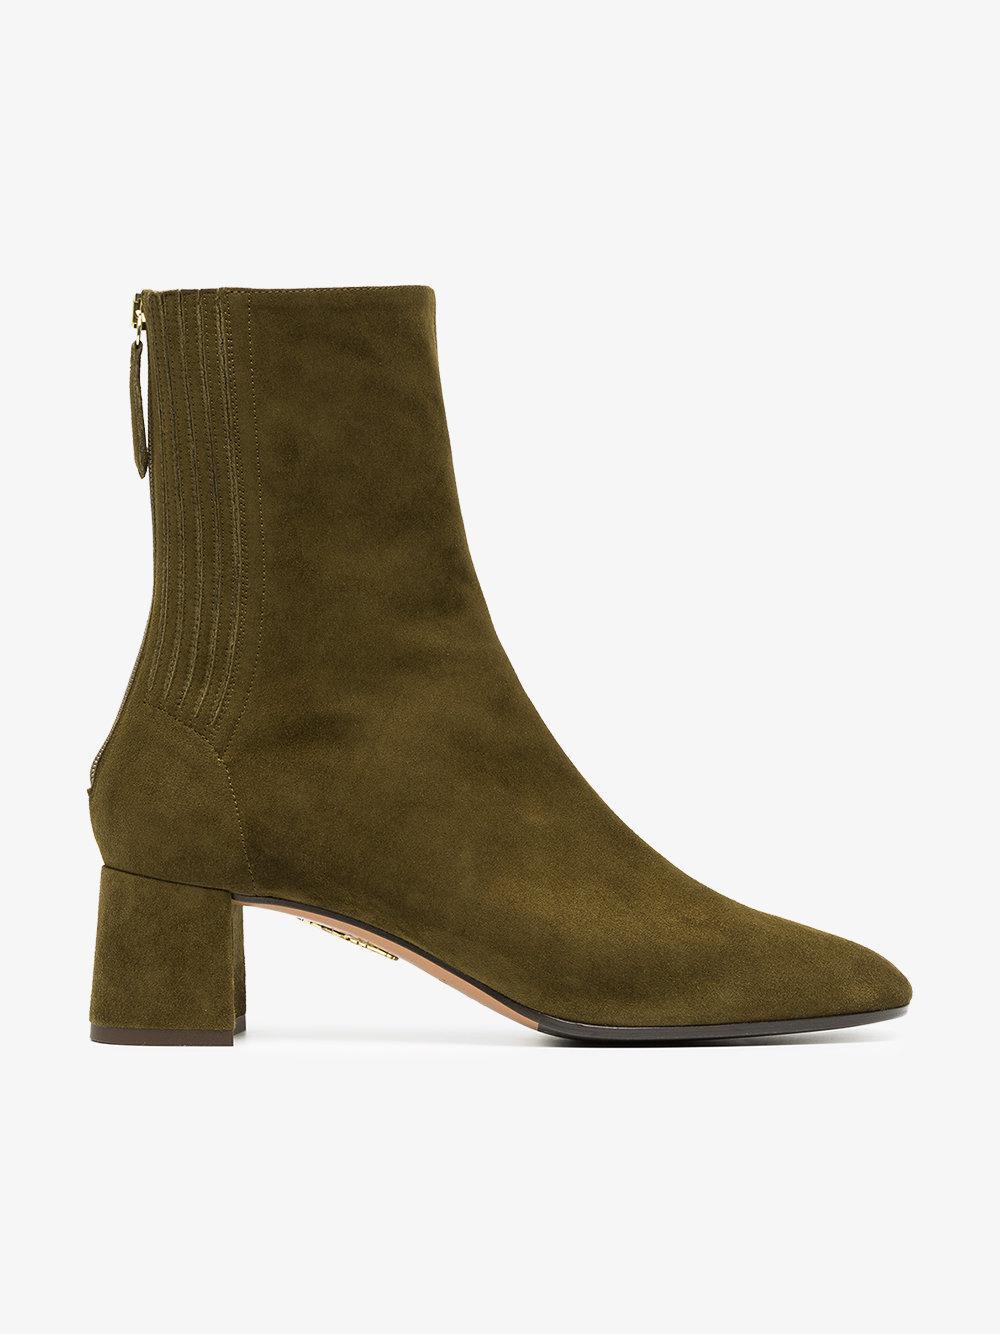 green saint honore 50 suede leather boots Aquazzura 0jLkSzi